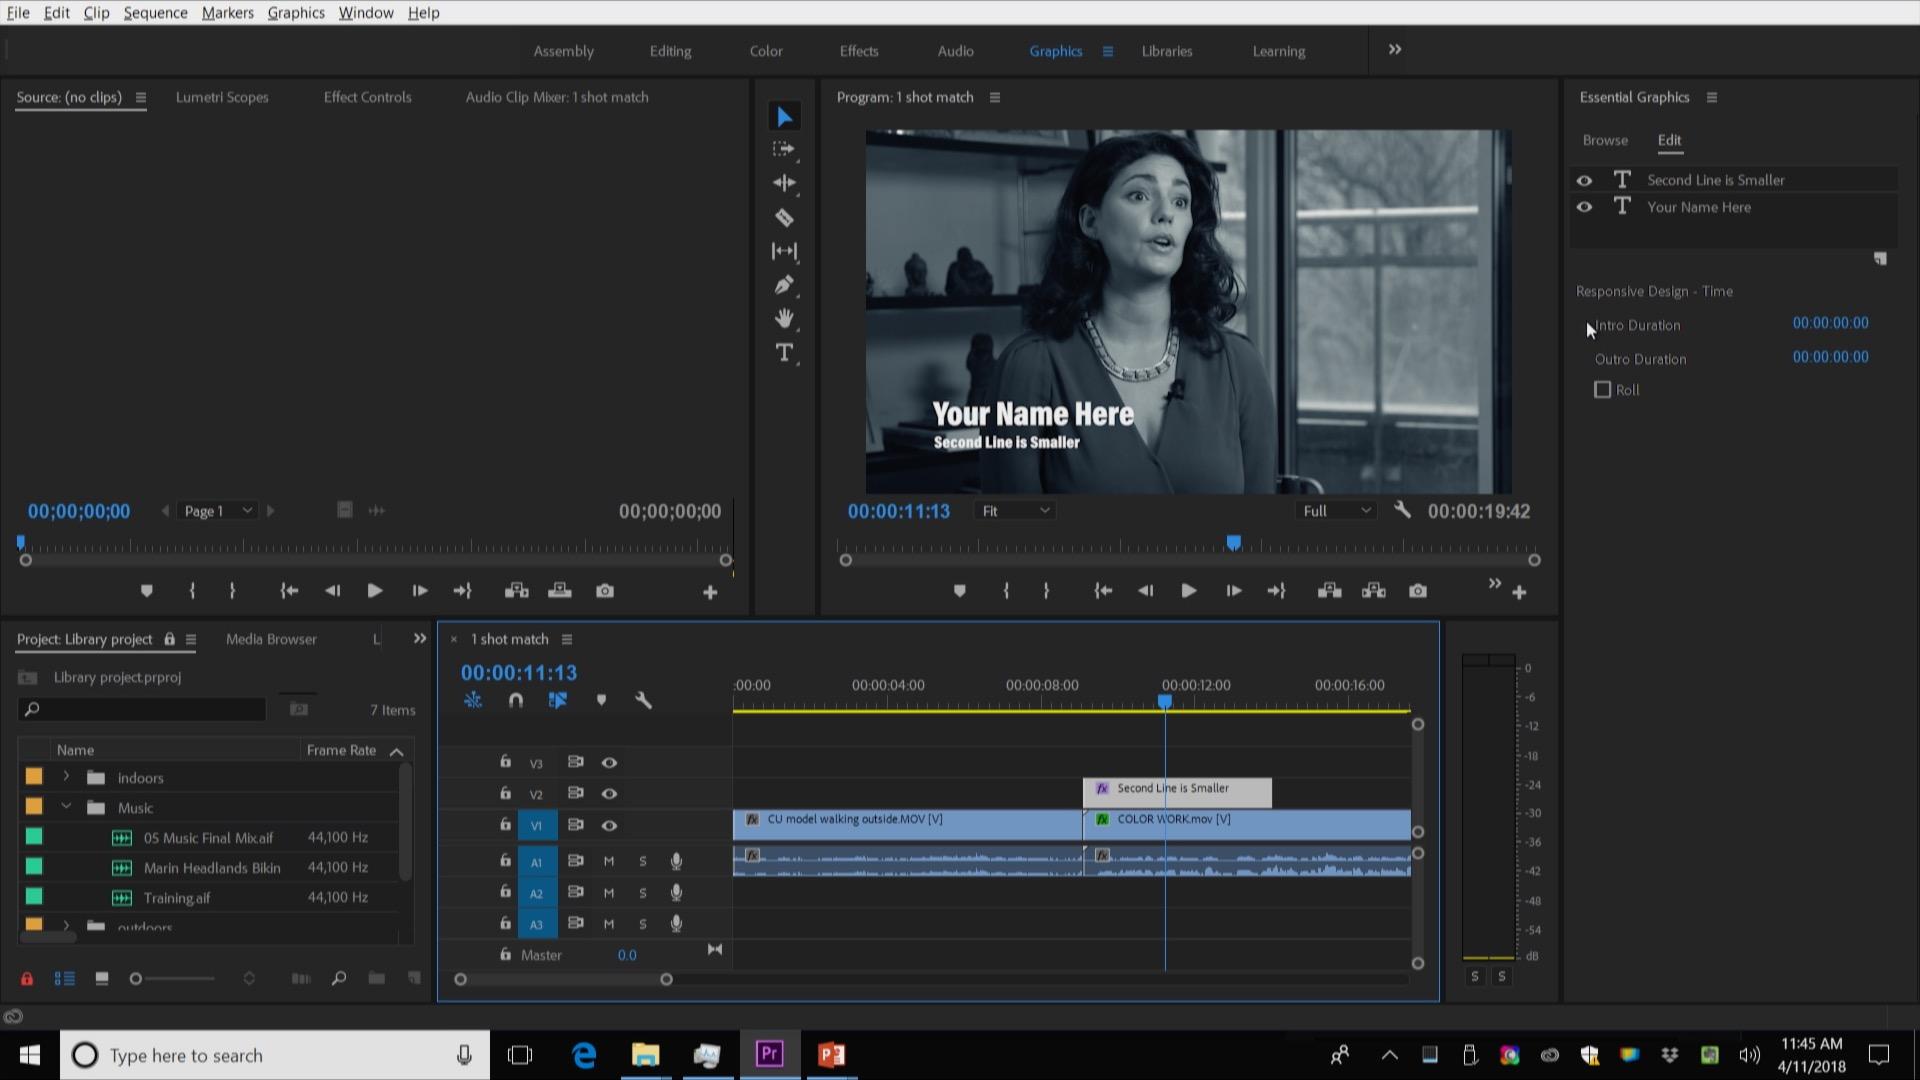 Premiere Pro - Essential Graphics Panel